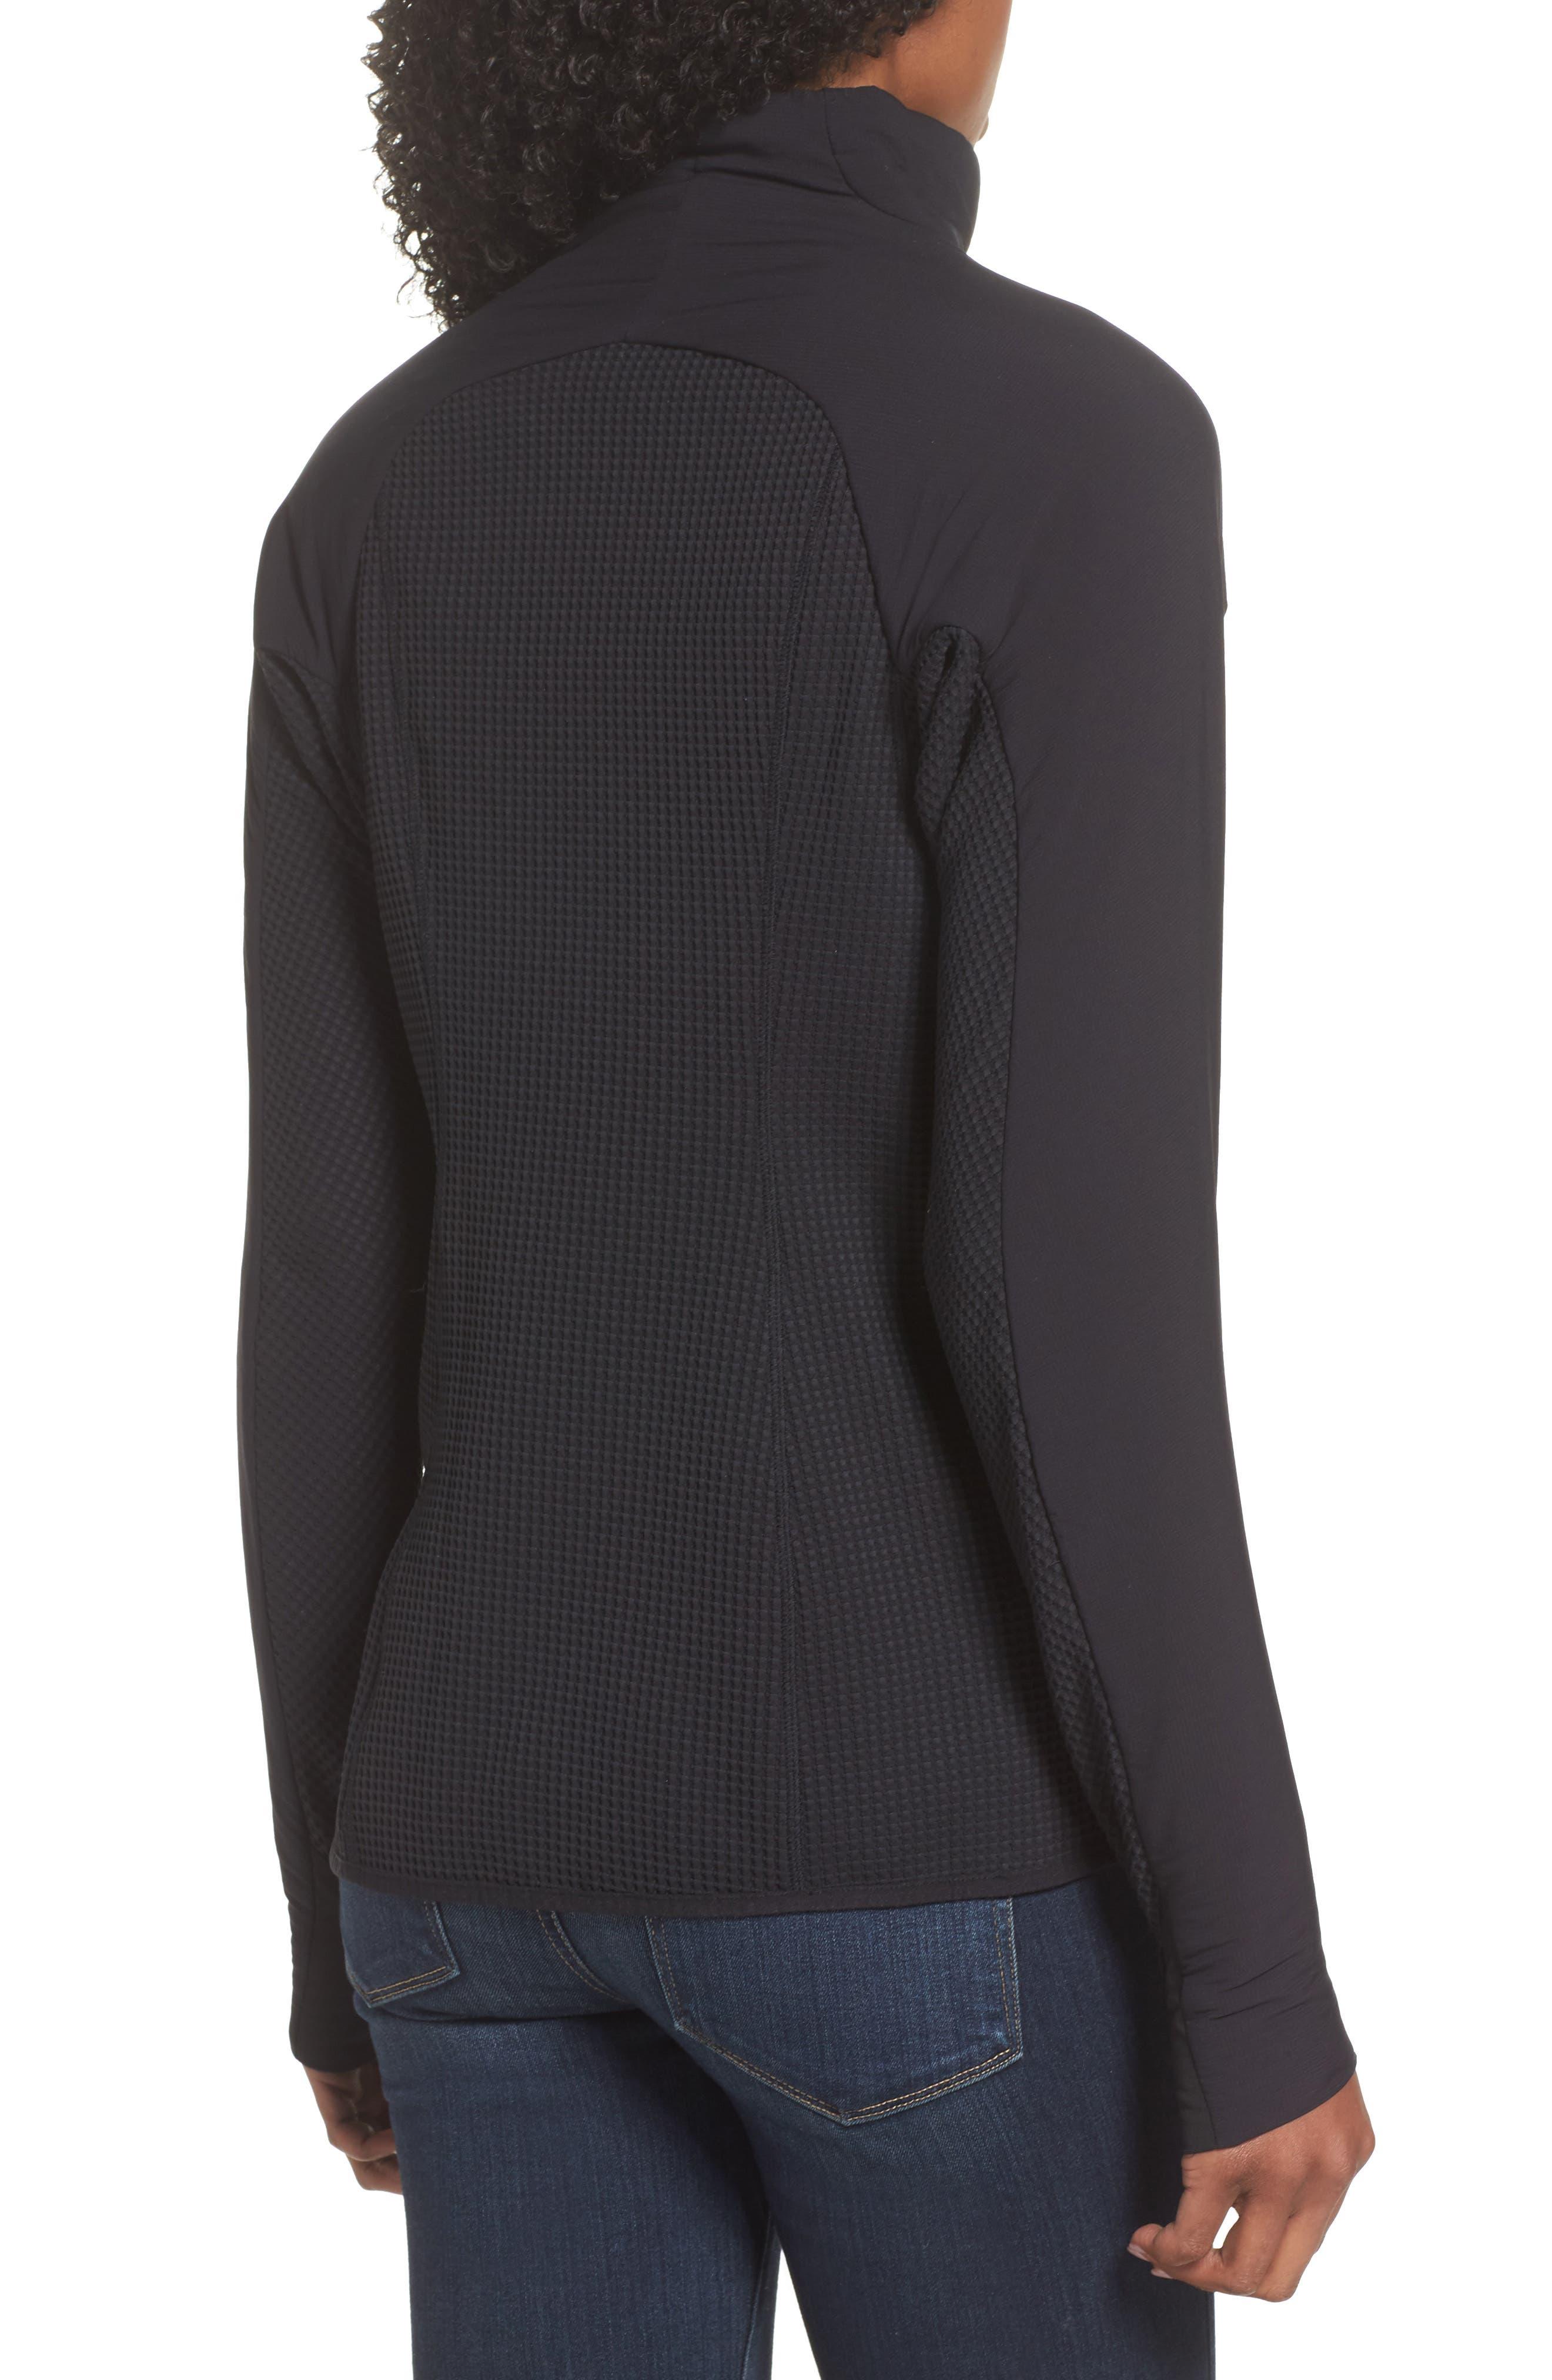 PATAGONIA, Nano-Air<sup>®</sup> Light Hybrid Jacket, Alternate thumbnail 2, color, BLACK